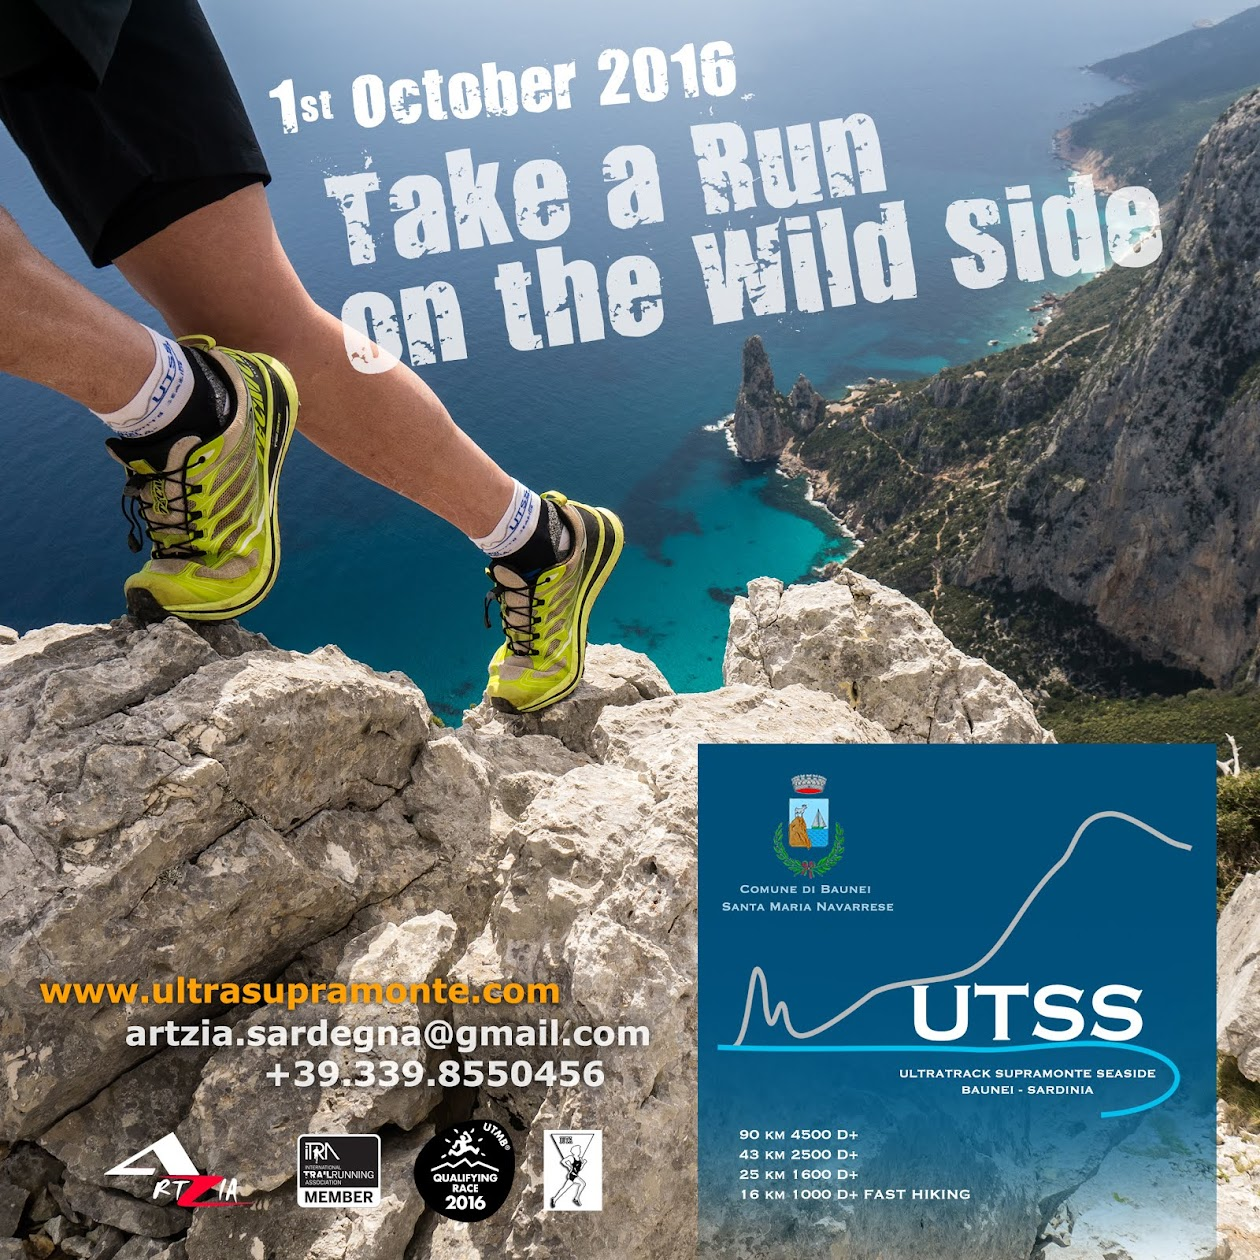 UTSS Ultra Track Supramonte Seaside